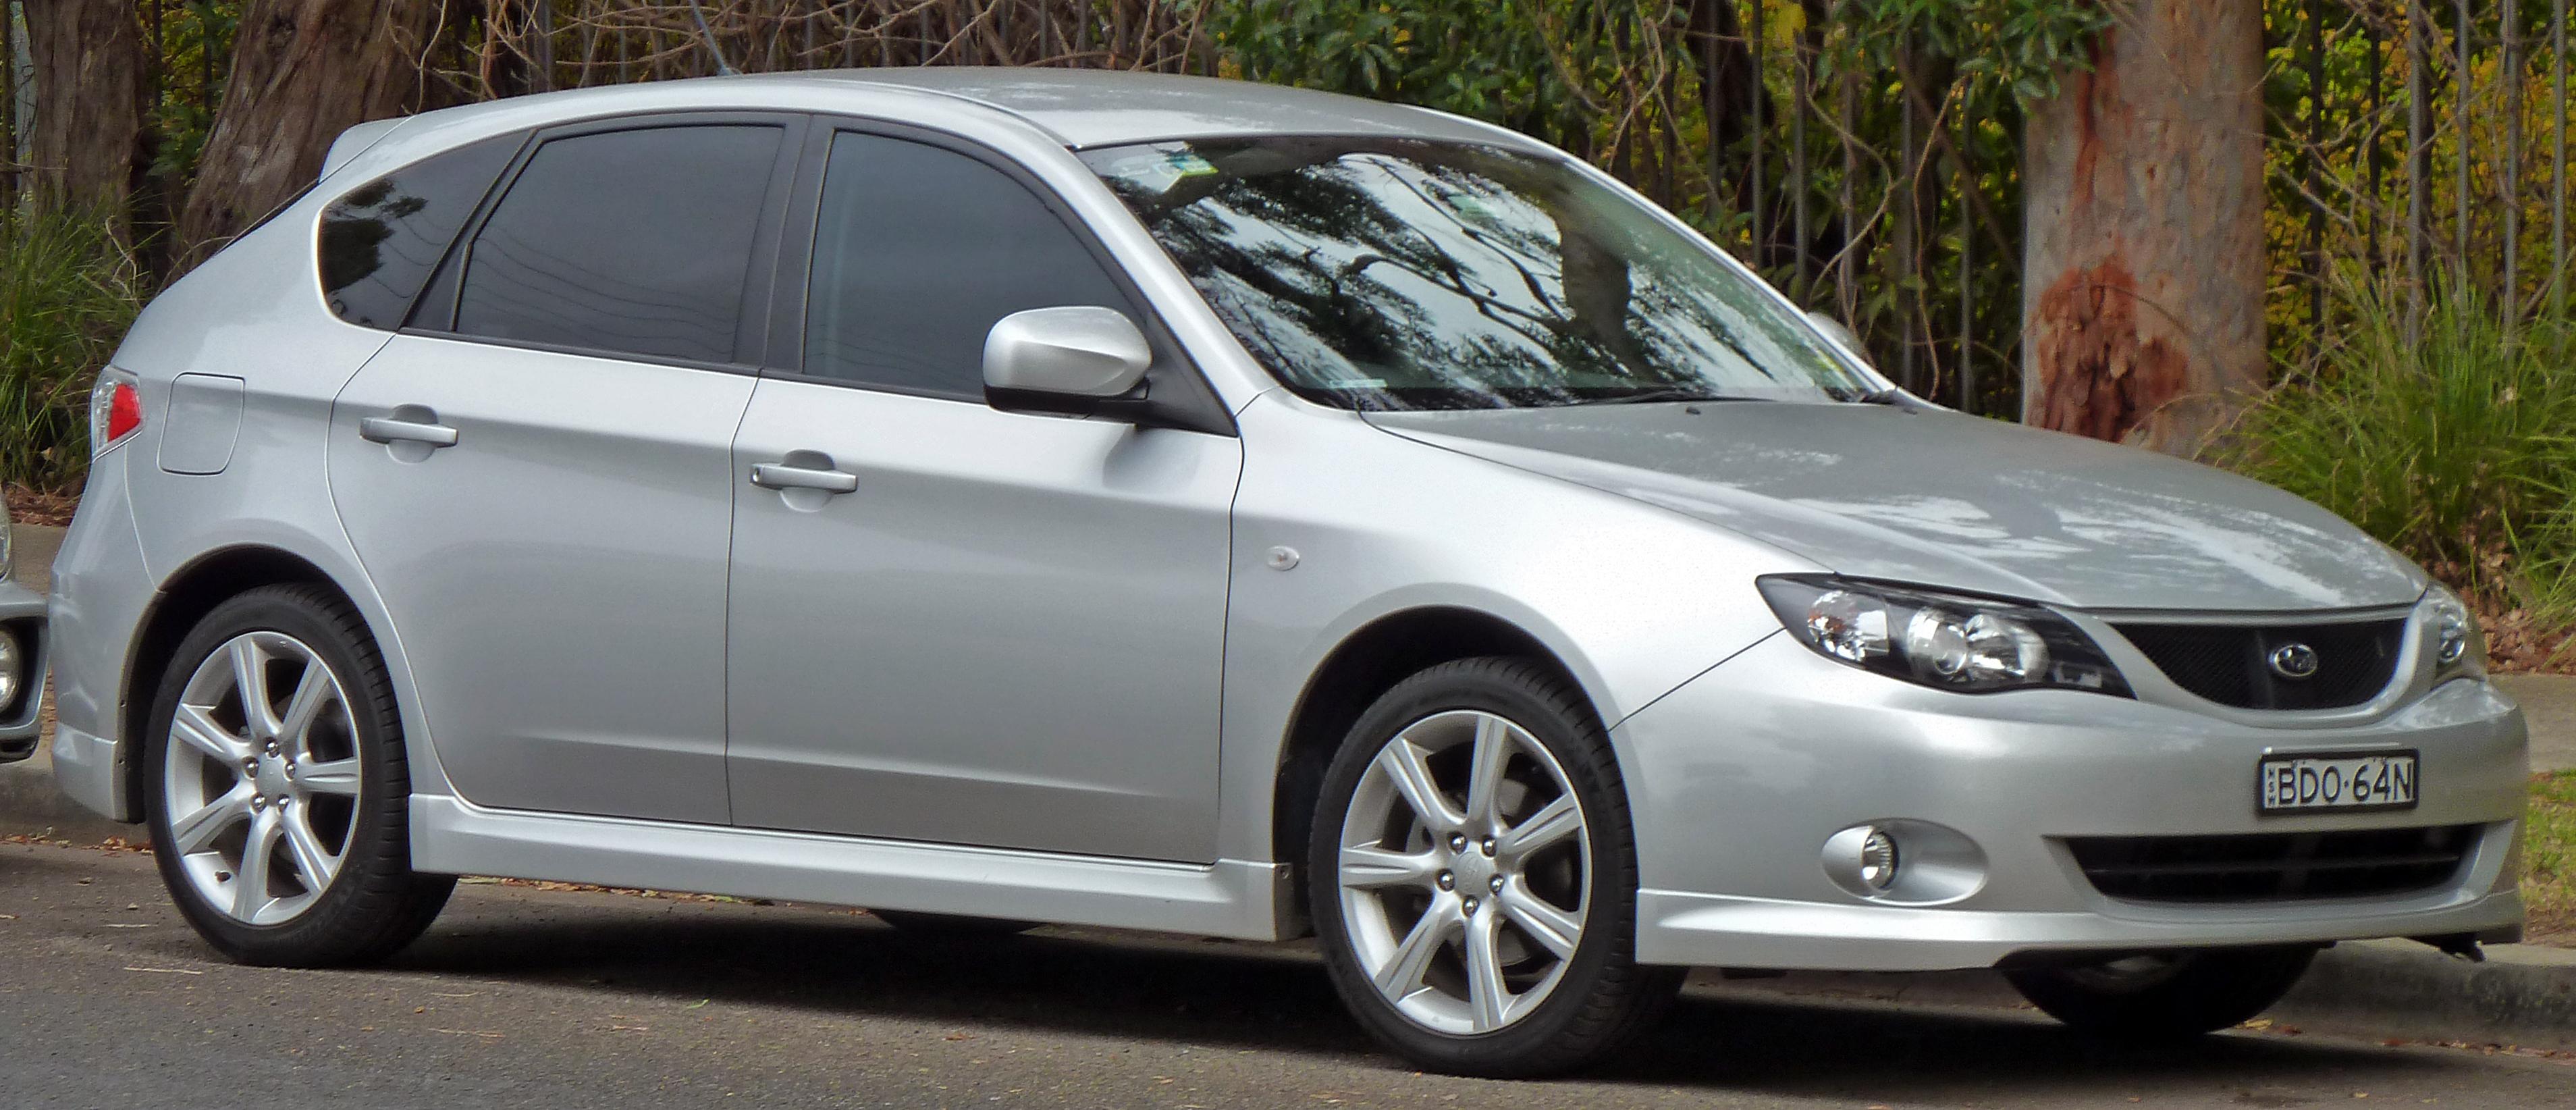 2010 Subaru Impreza Image 15